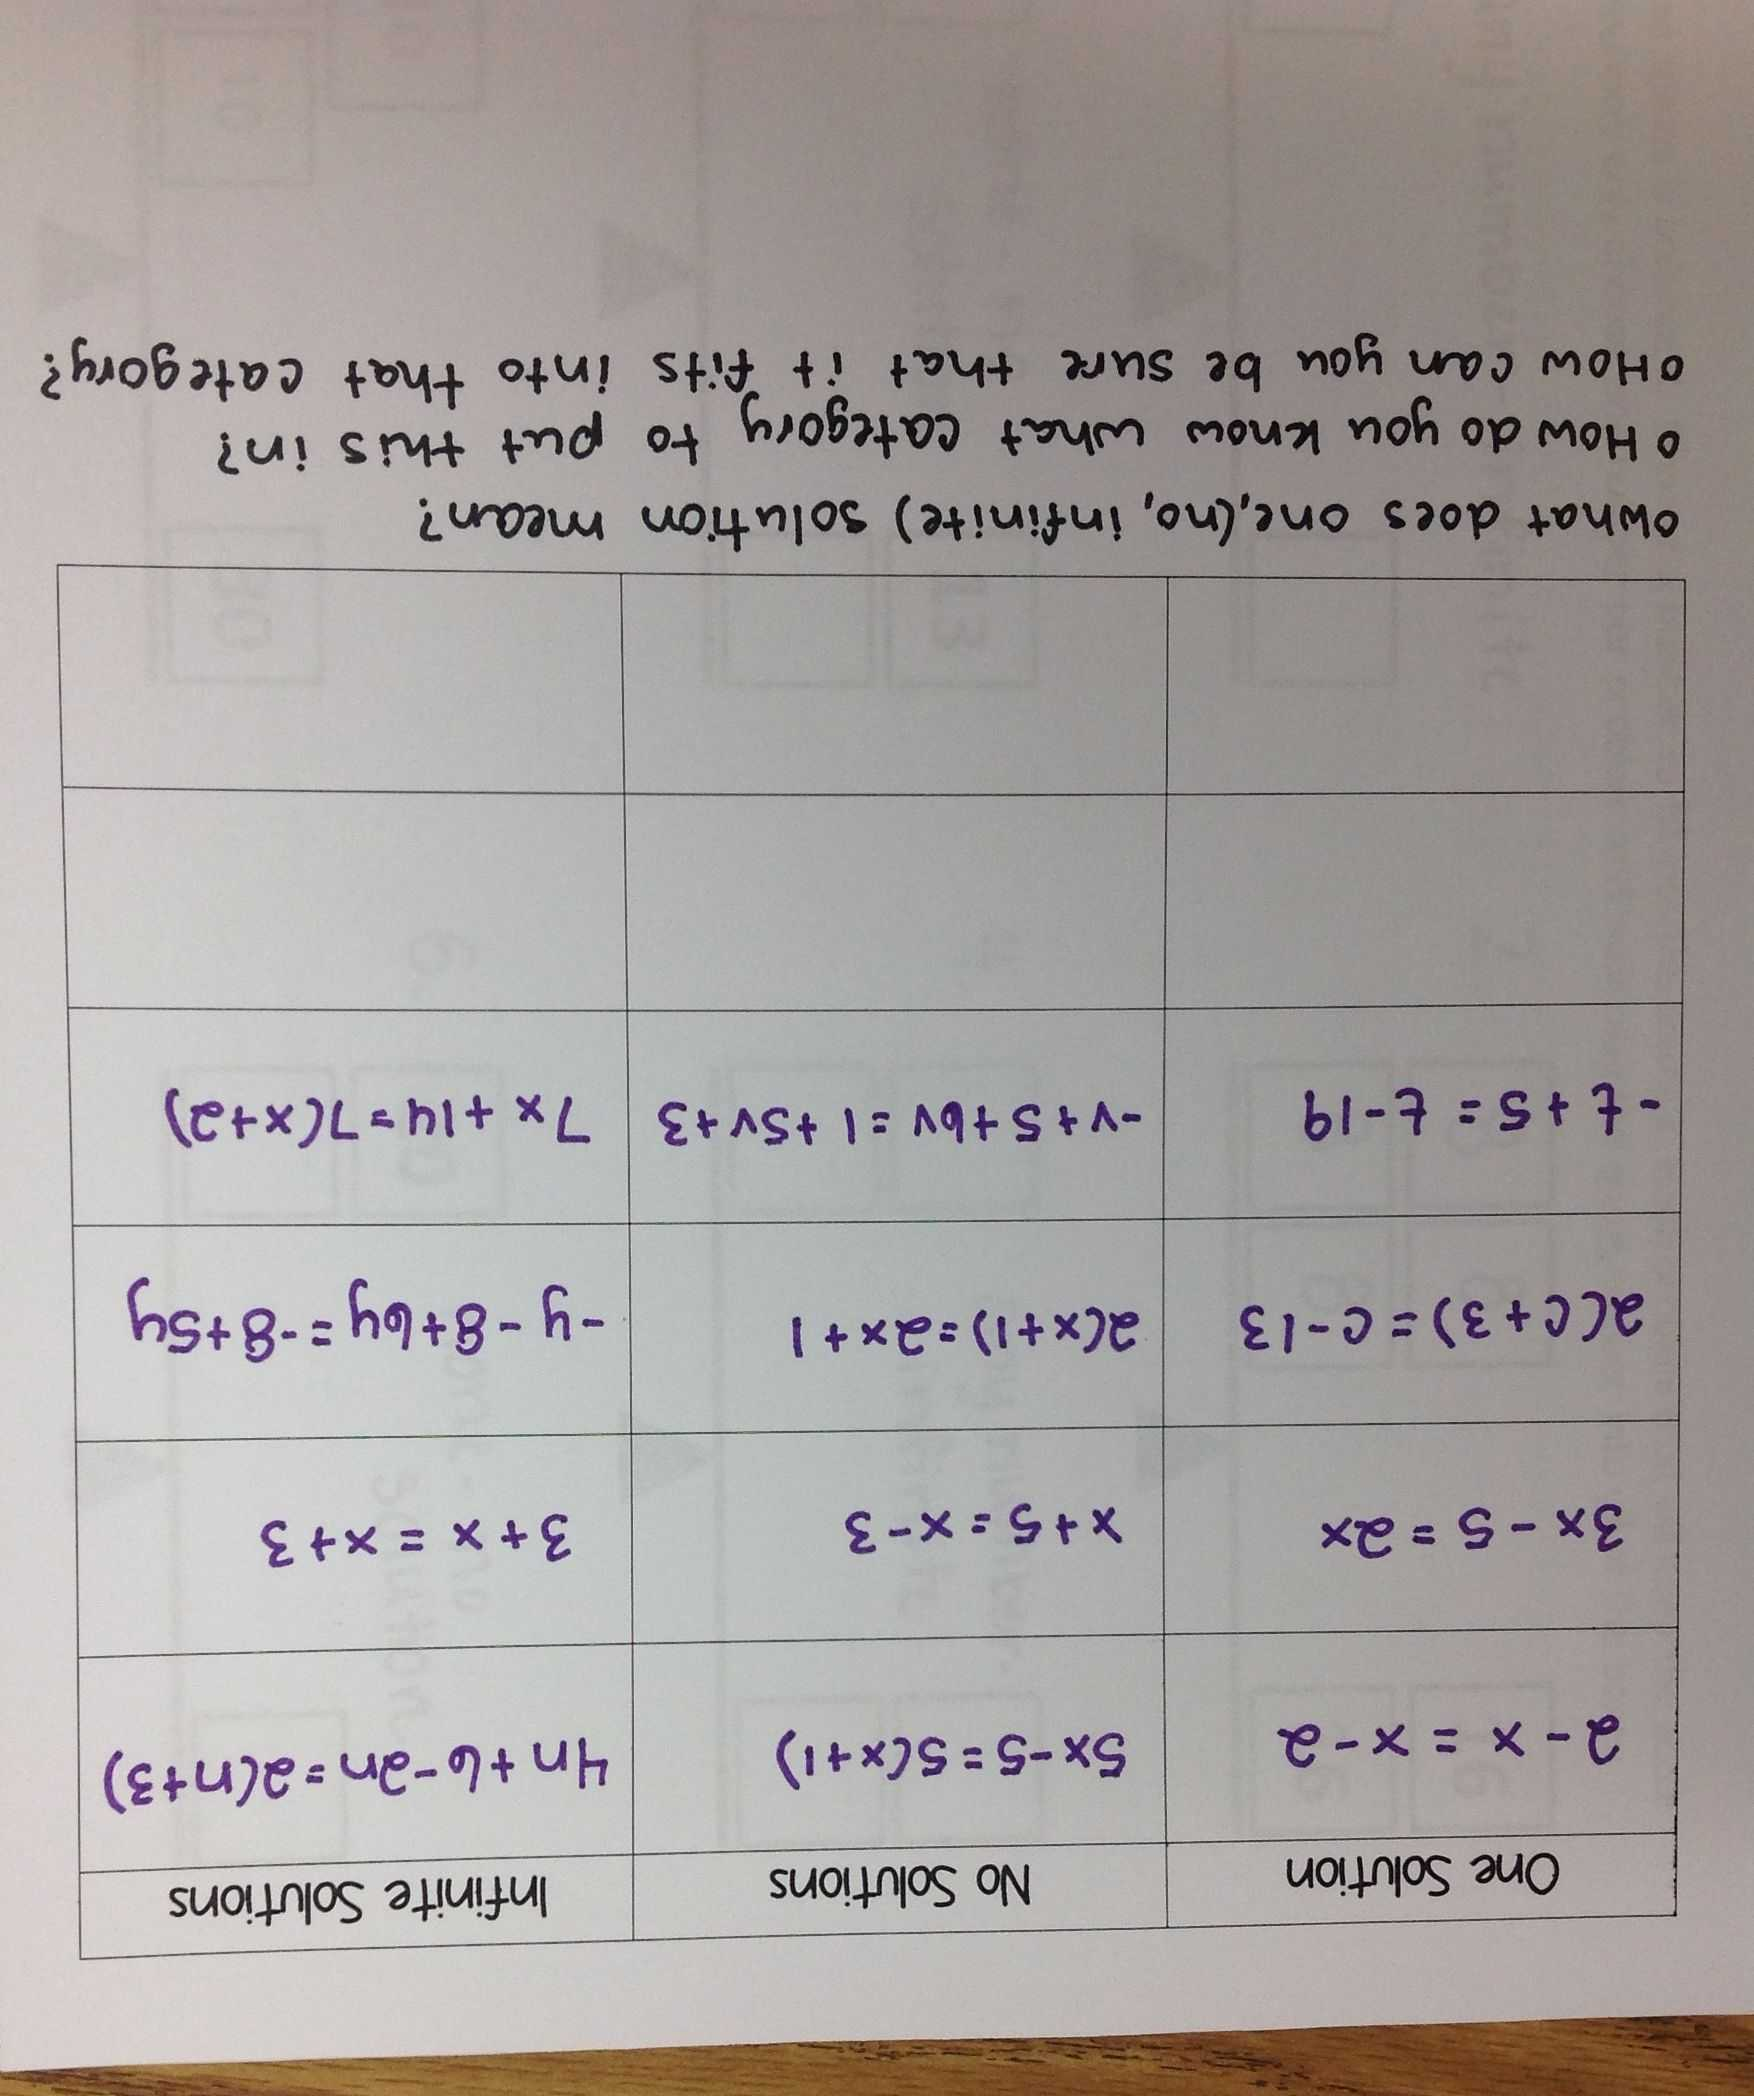 Interpreting Graphics Worksheet Answers Chemistry Or Eur